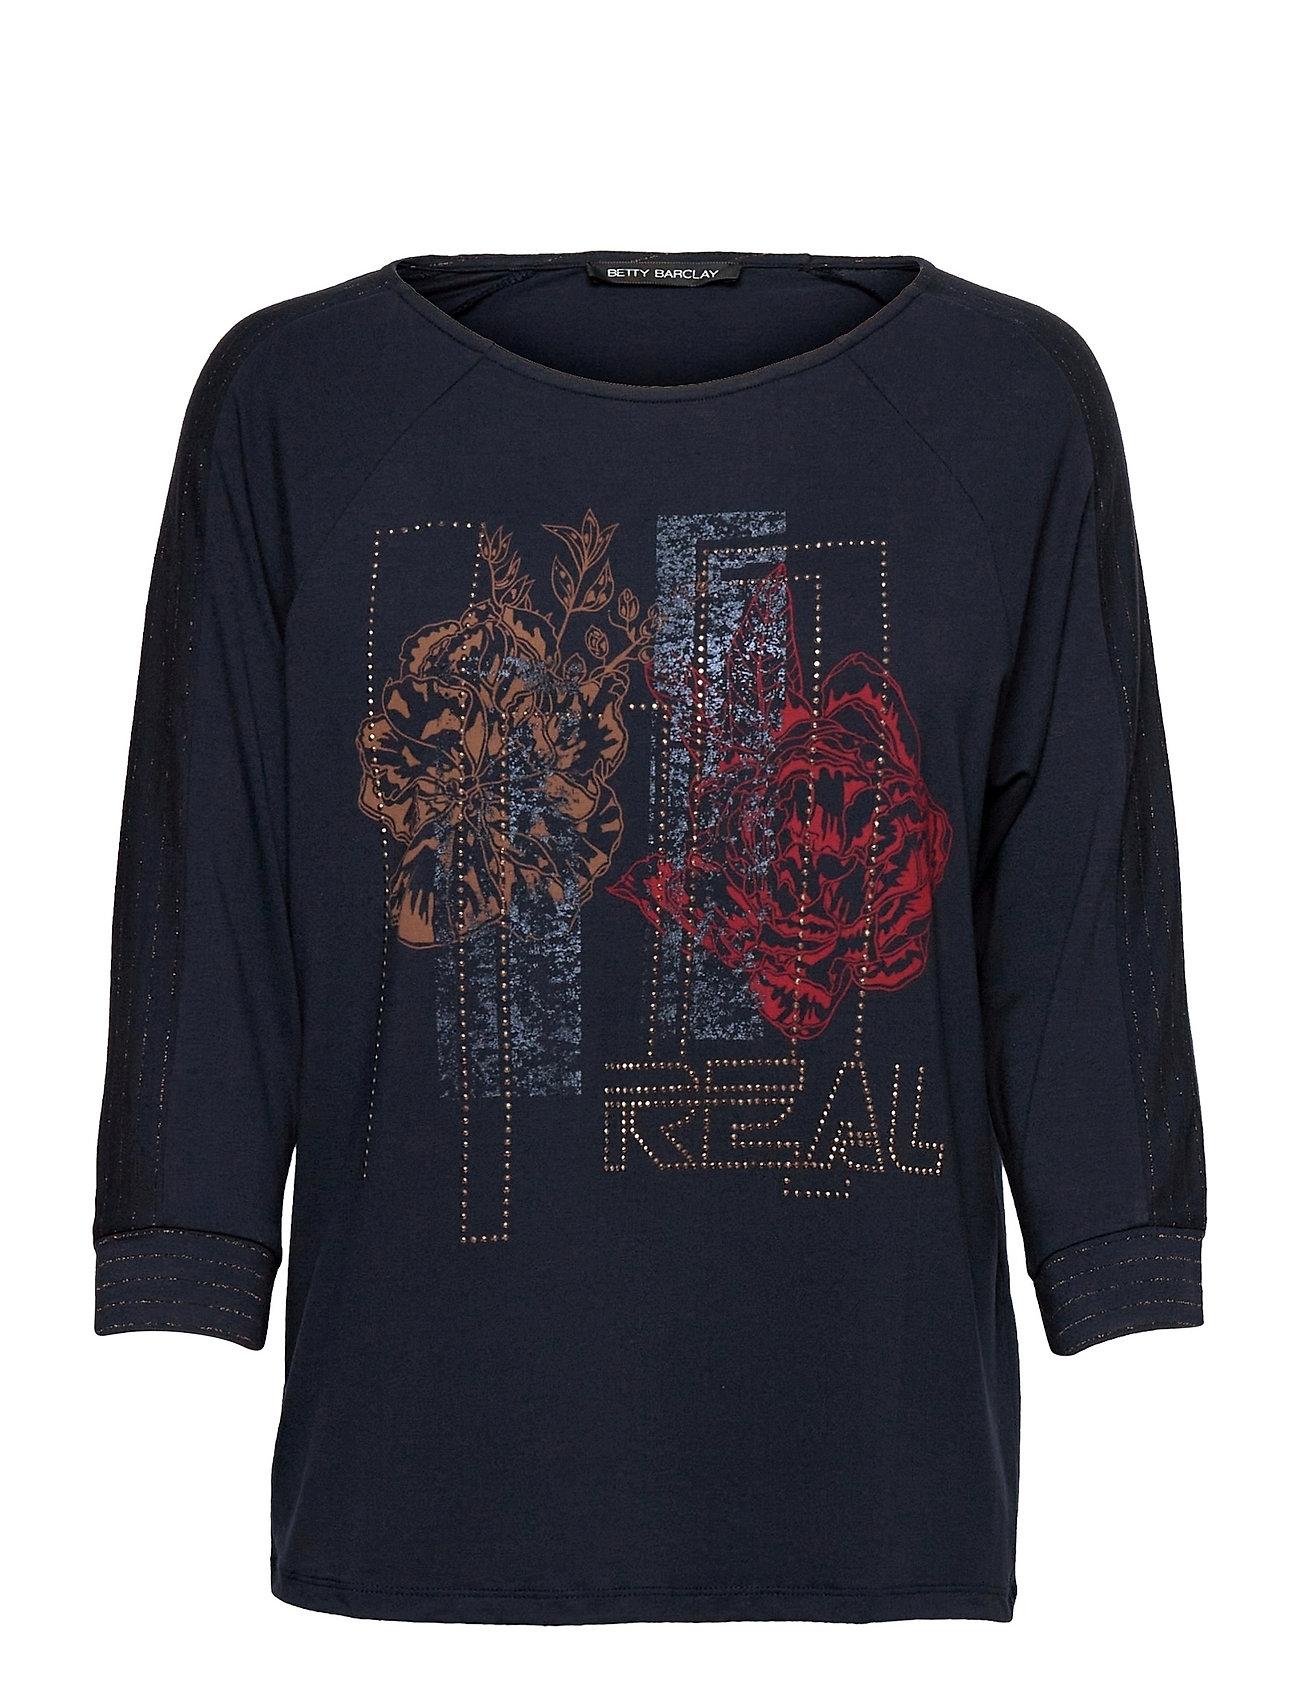 Shirt Short 3/4 Sleeve Langærmet T-shirt Blå Betty Barclay